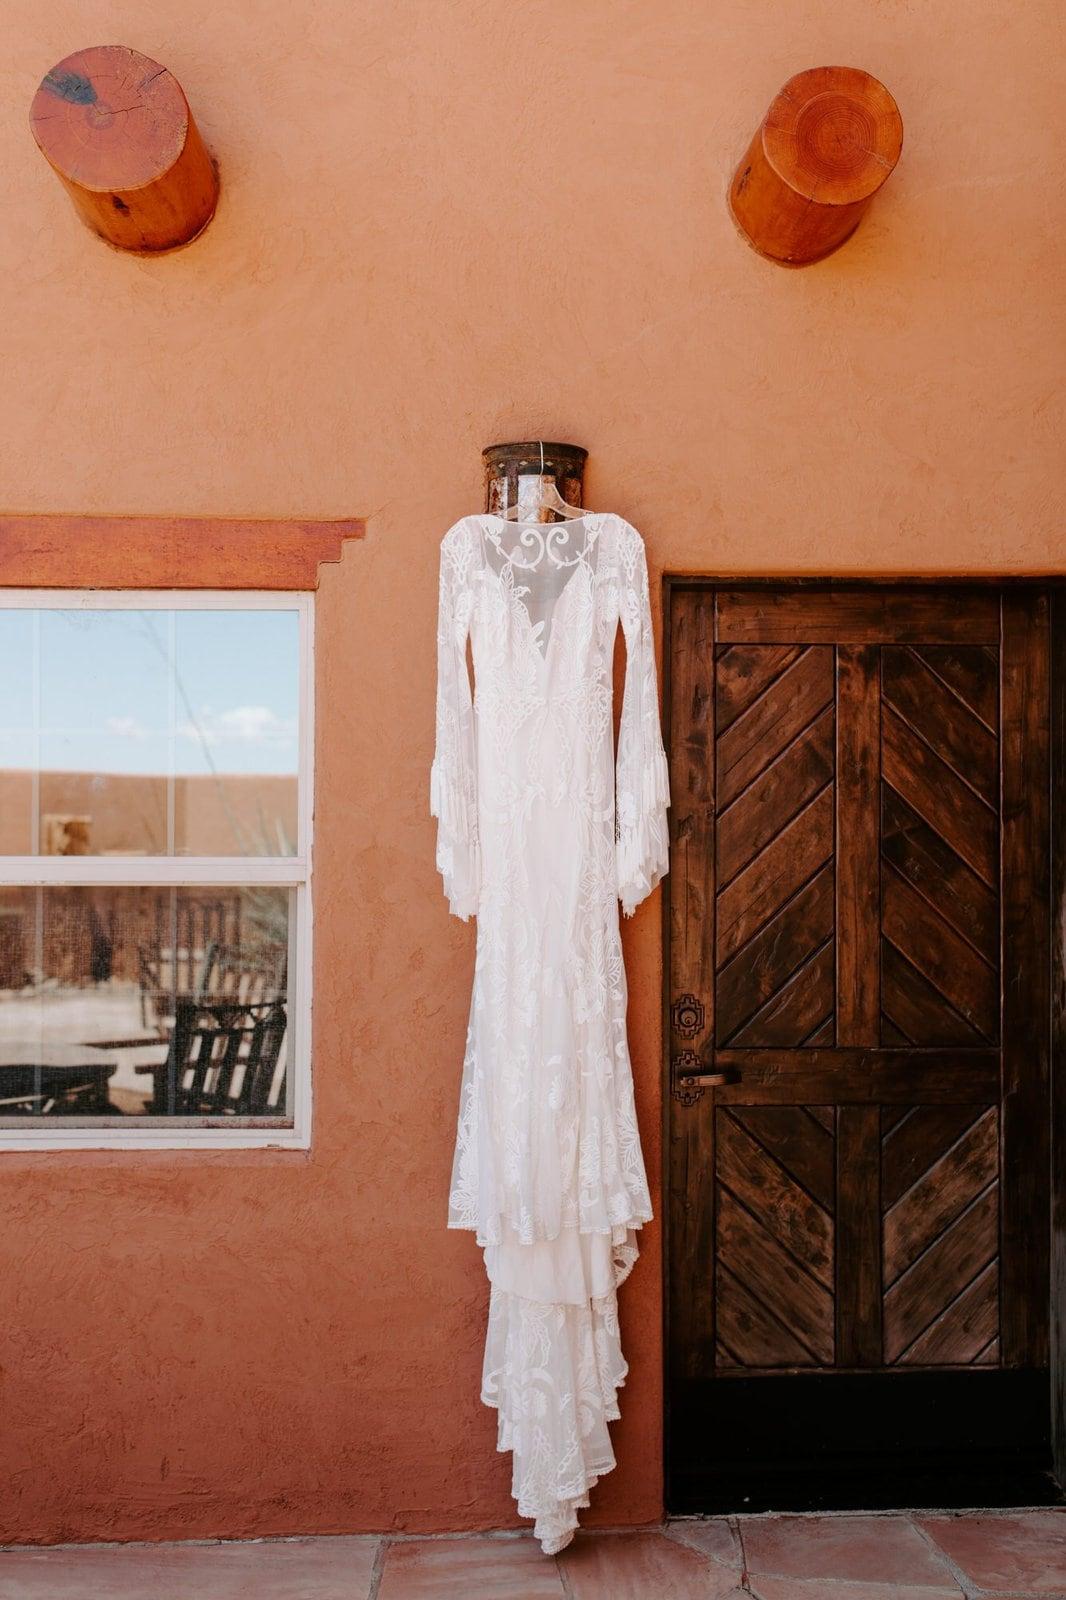 rue de seine wedding dress detail shot.